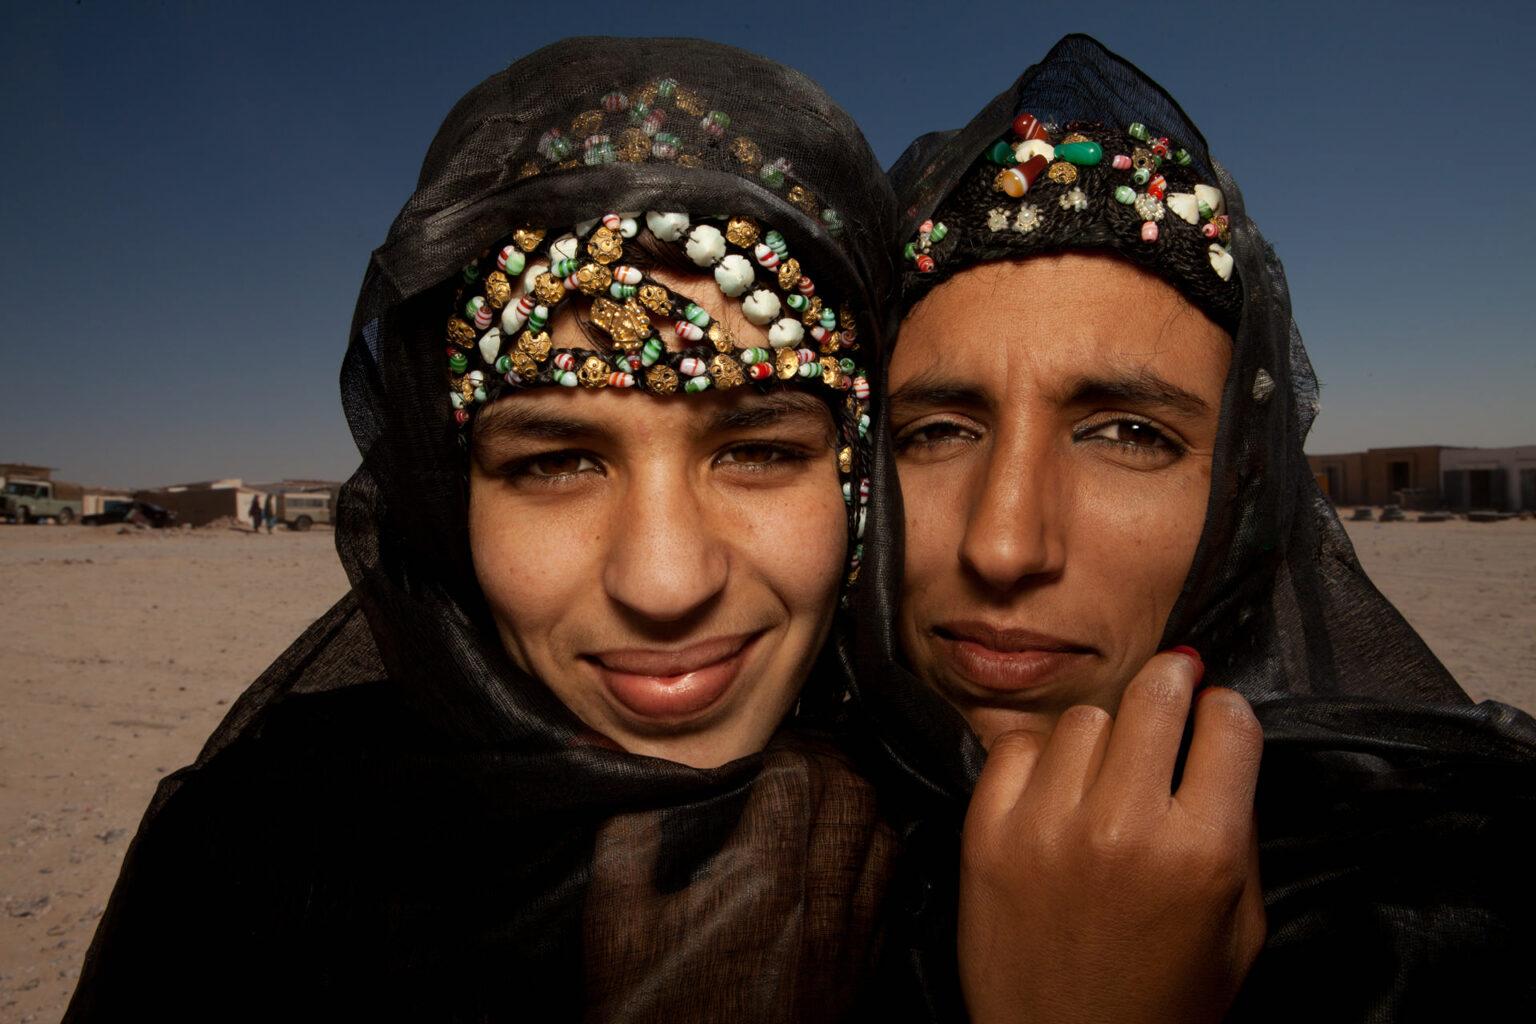 Laayoune Refugee Camp, Algeria, 2015